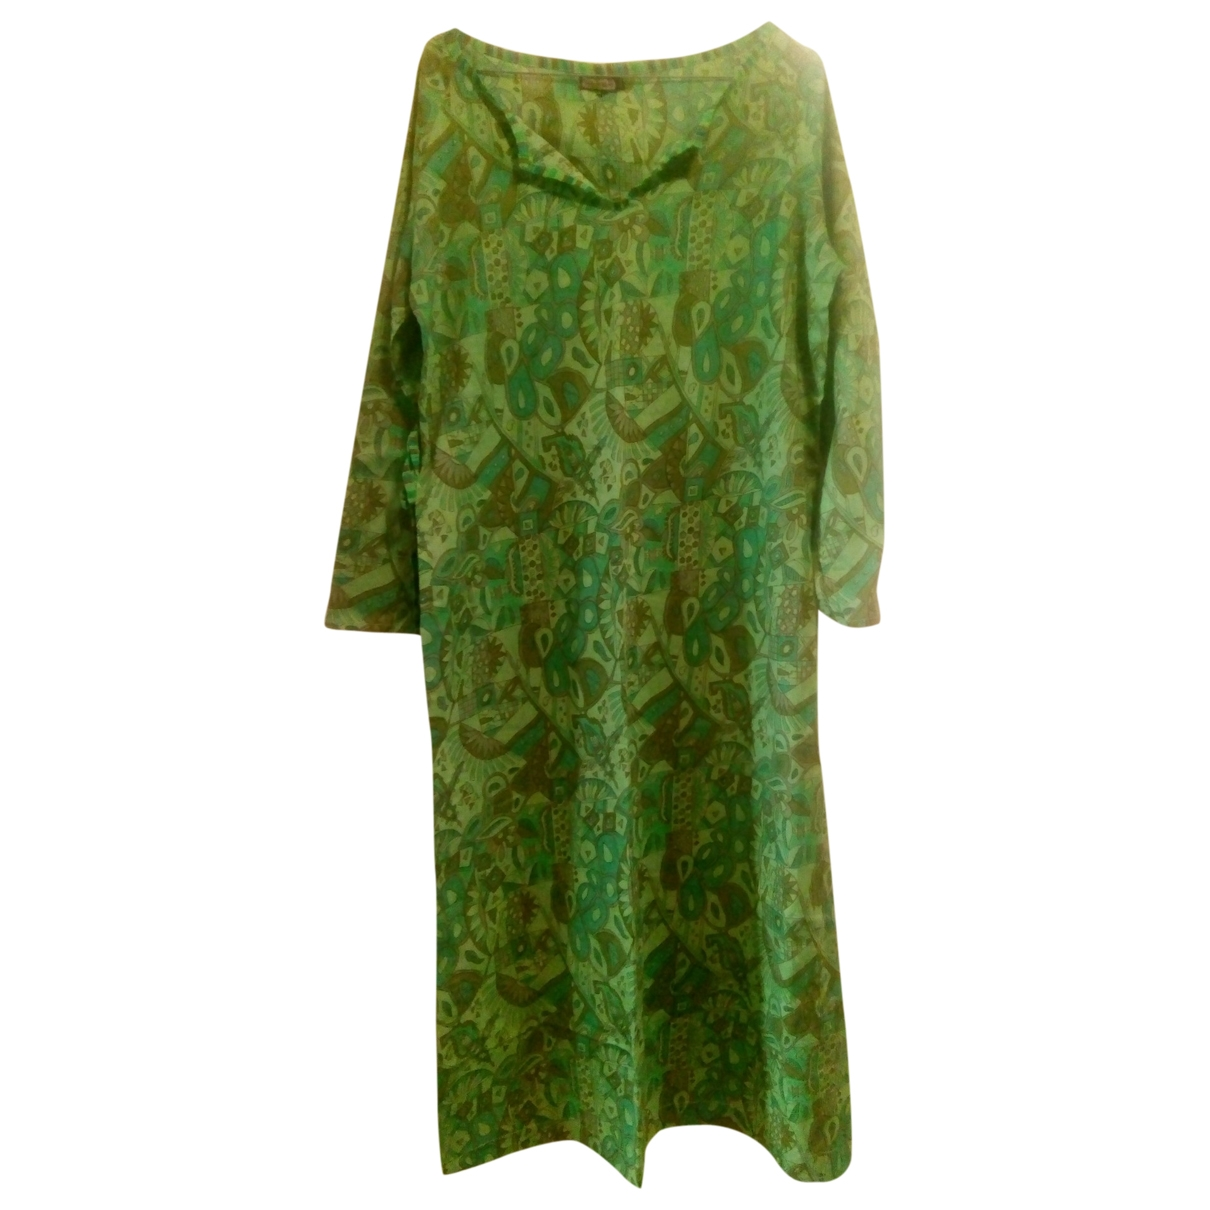 Maliparmi \N Green Cotton dress for Women 46 IT